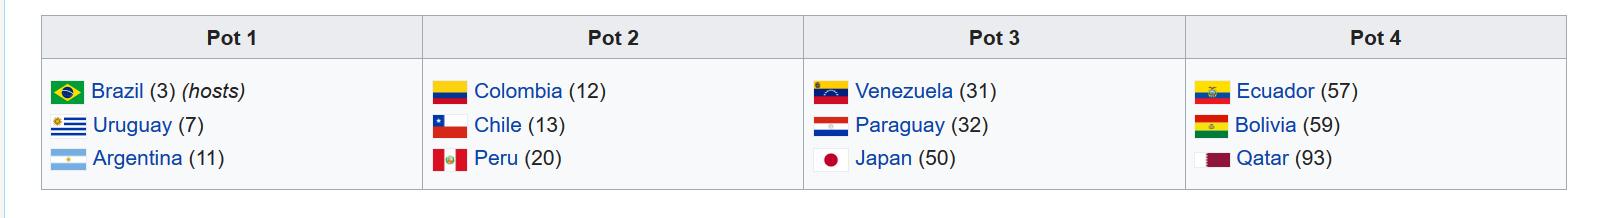 2019CopaAmericaDraw